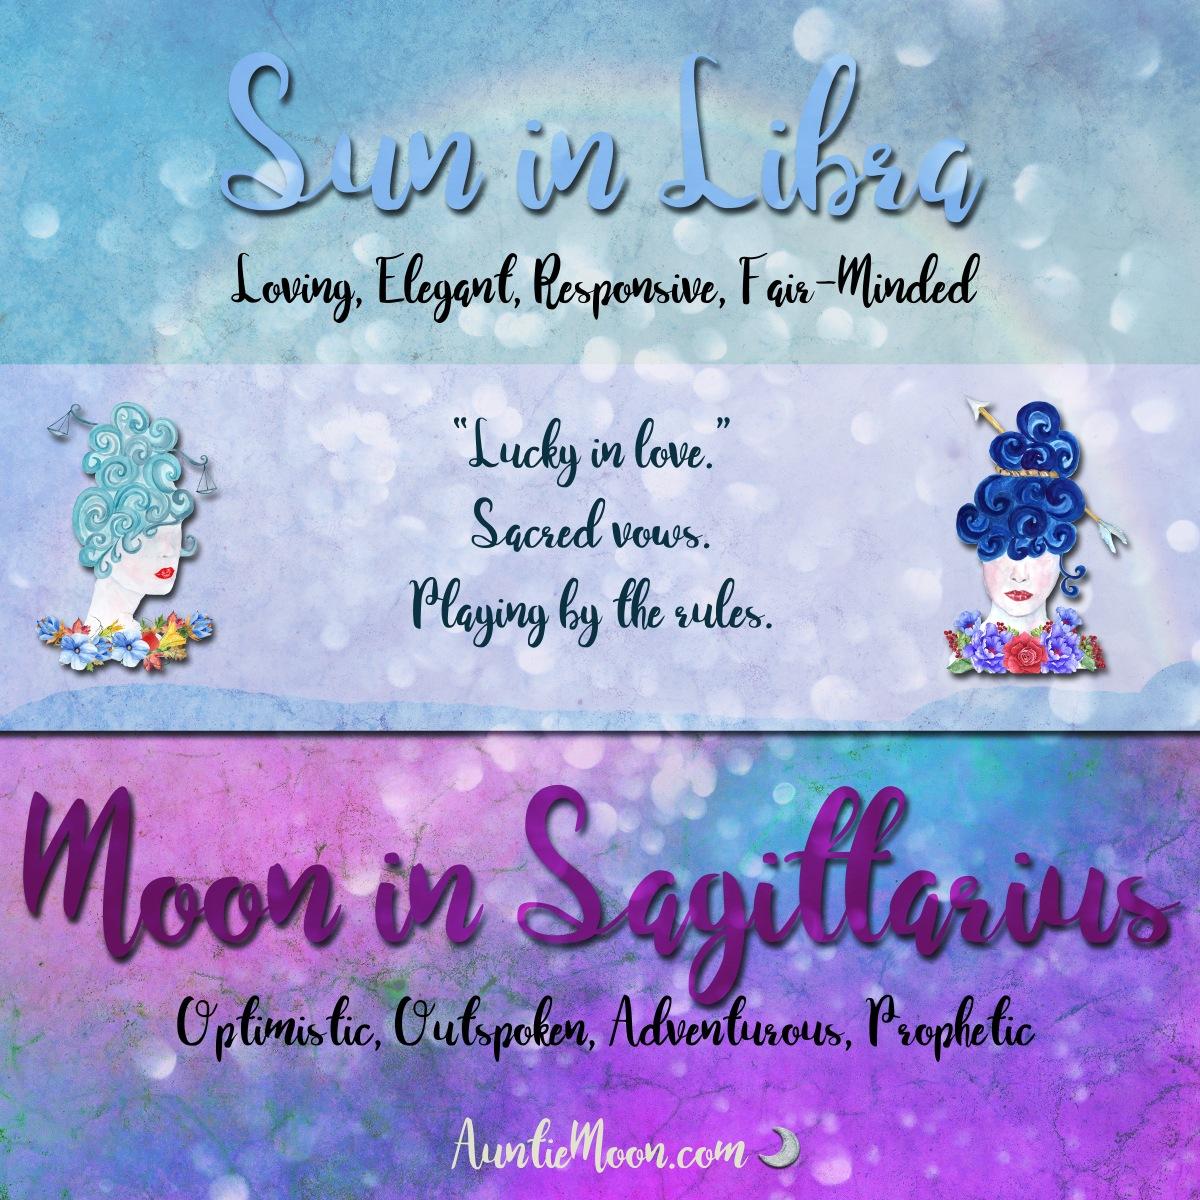 Sun in Libra ~ Moon in Sagittarius